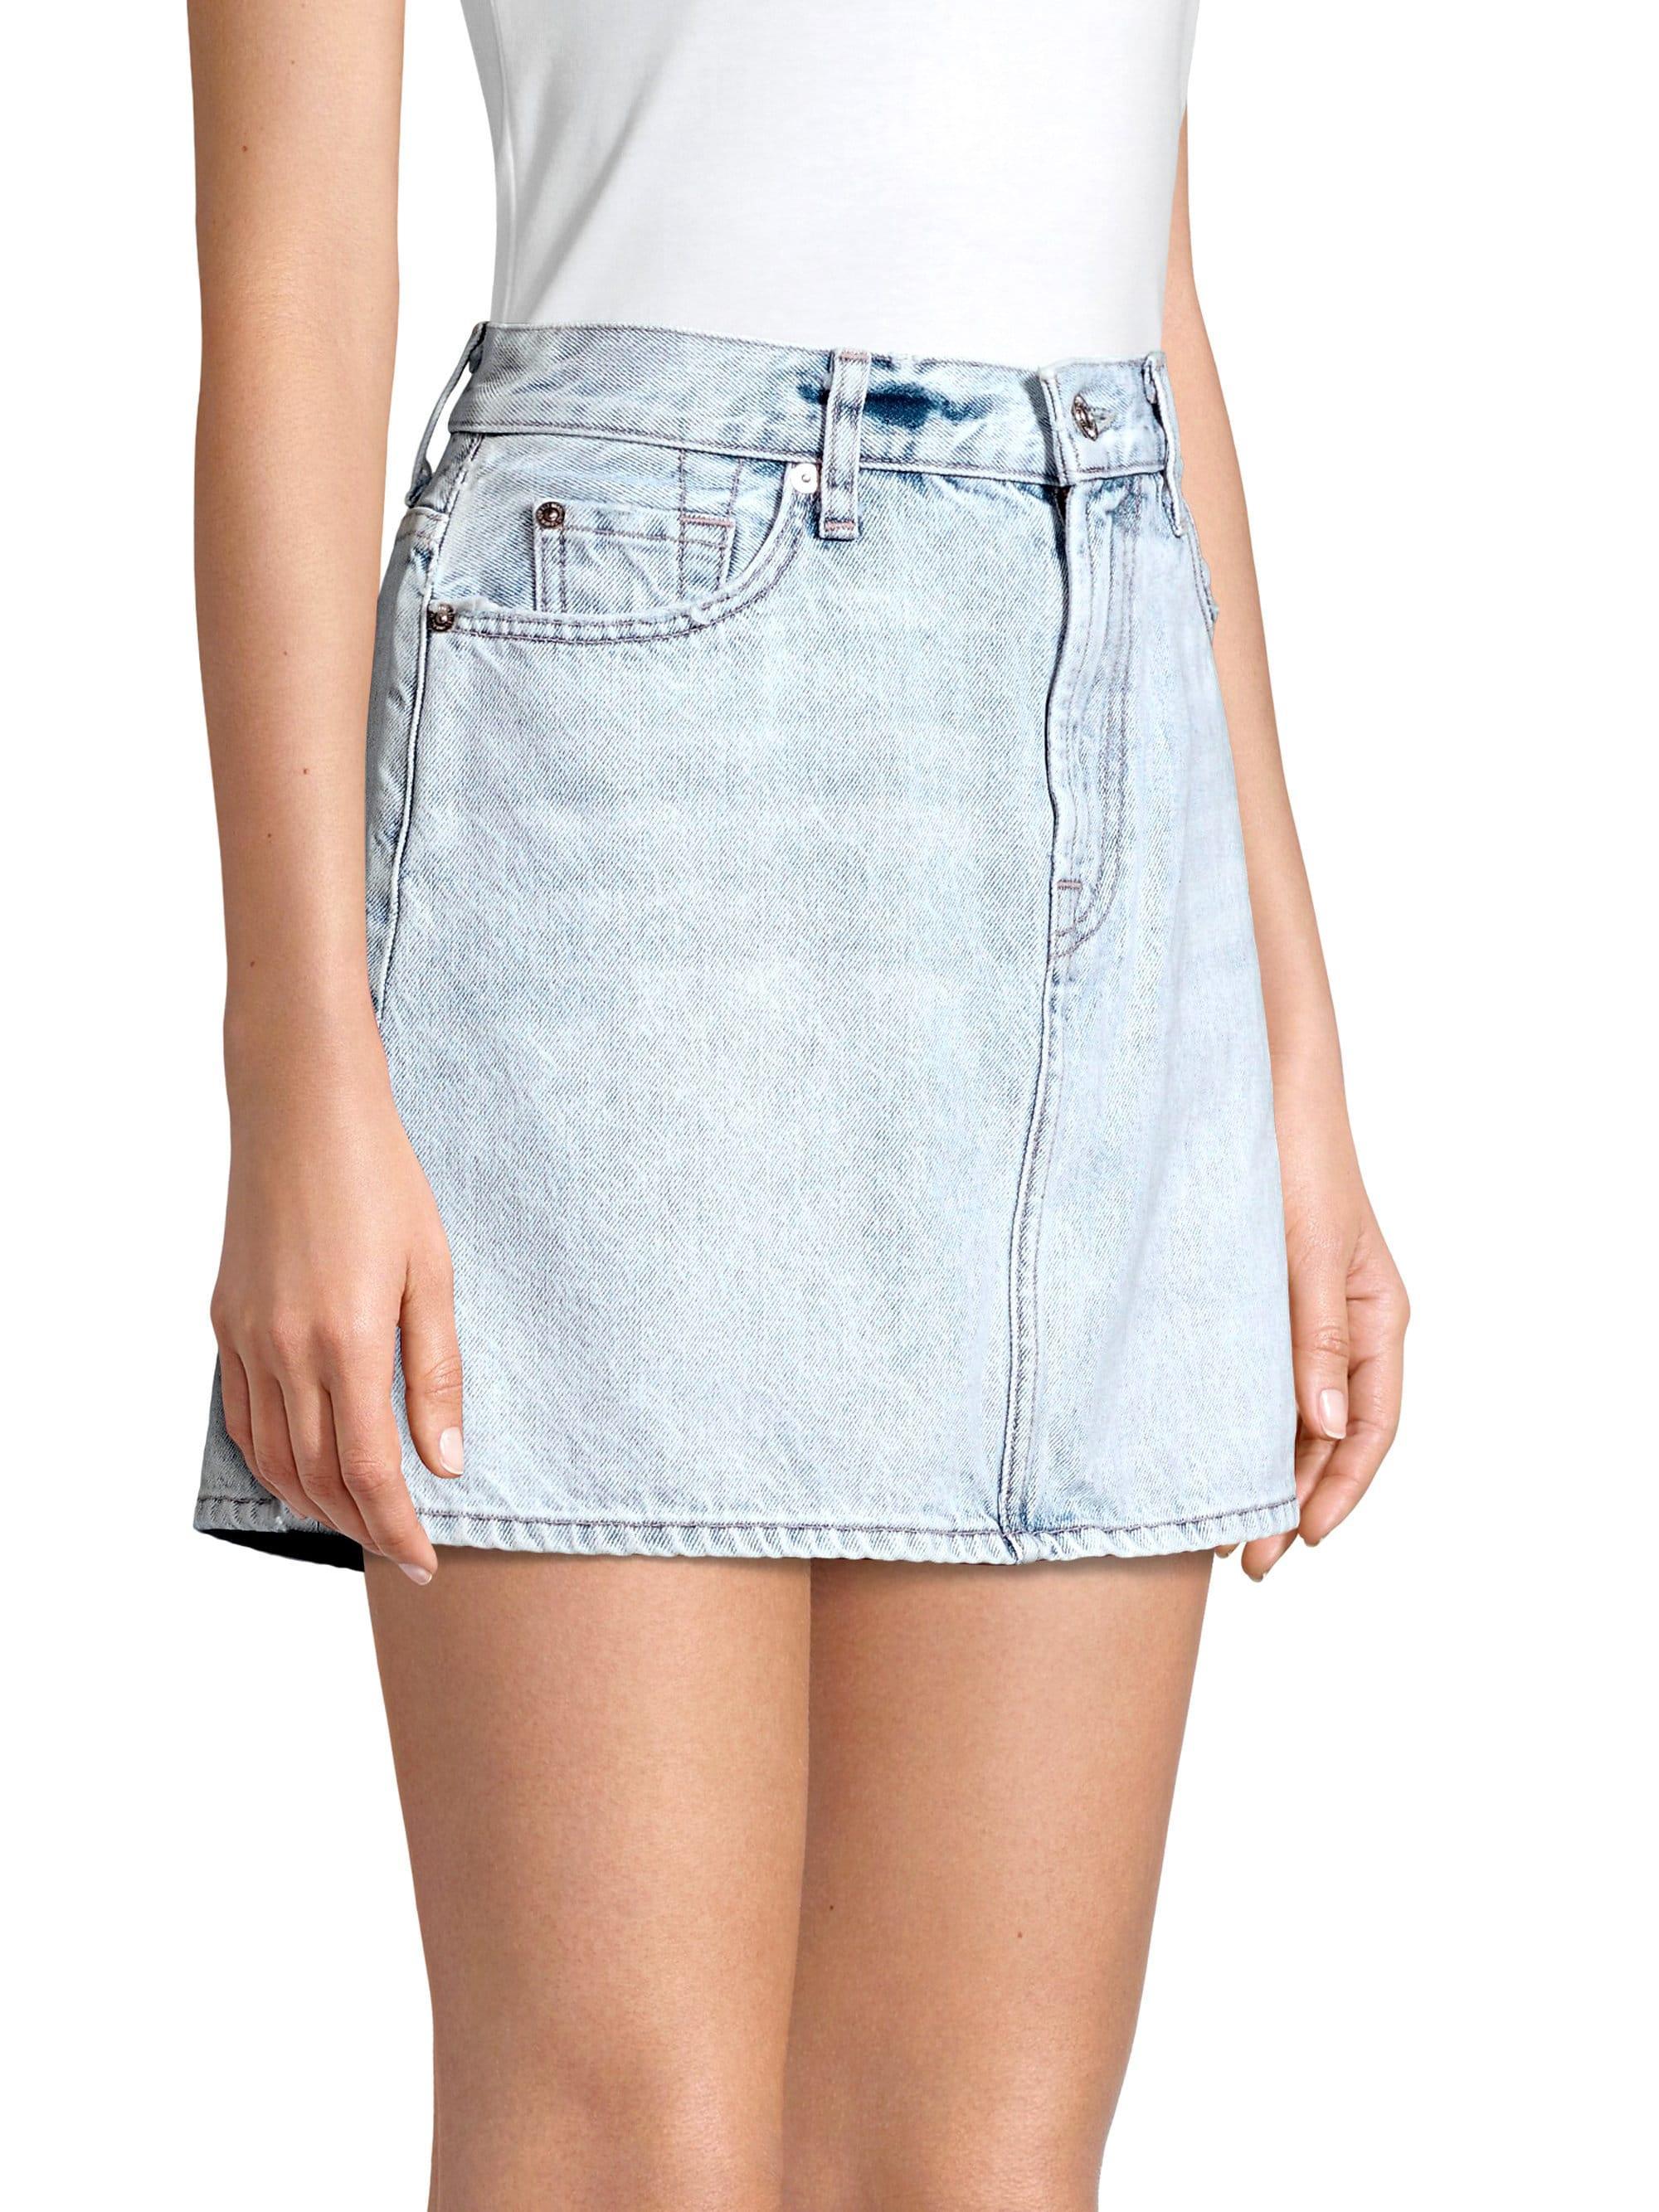 91ecc95cda2c5 Lyst - 7 For All Mankind Acid Wash Denim Mini Skirt in Blue